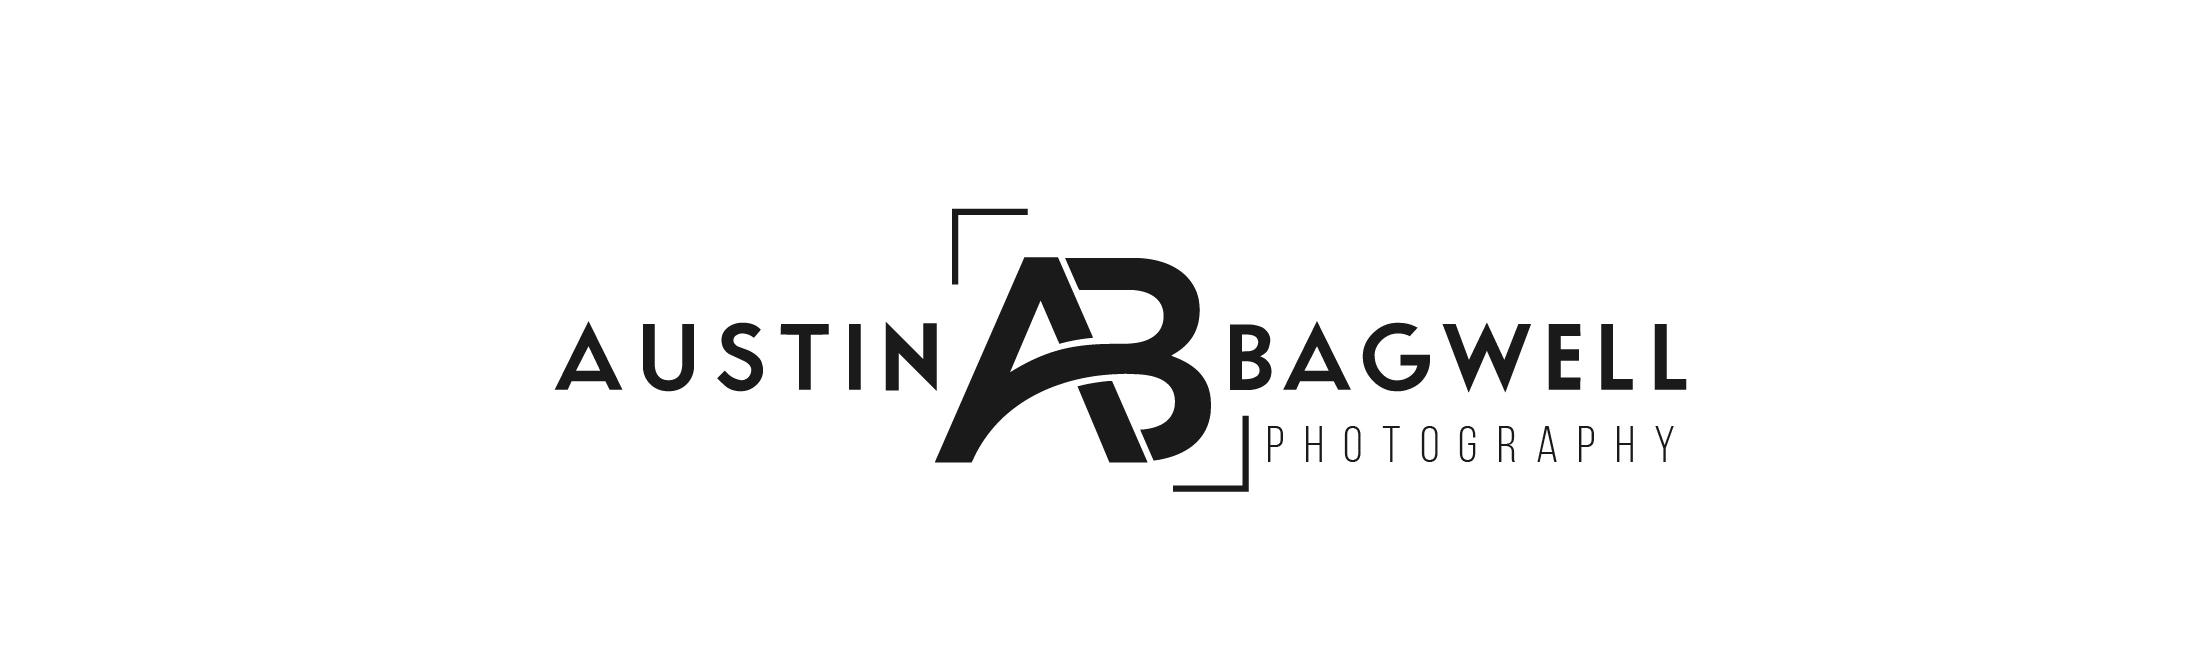 Austin Bagwell photography LLC floor plan in Havelock Jacksonville